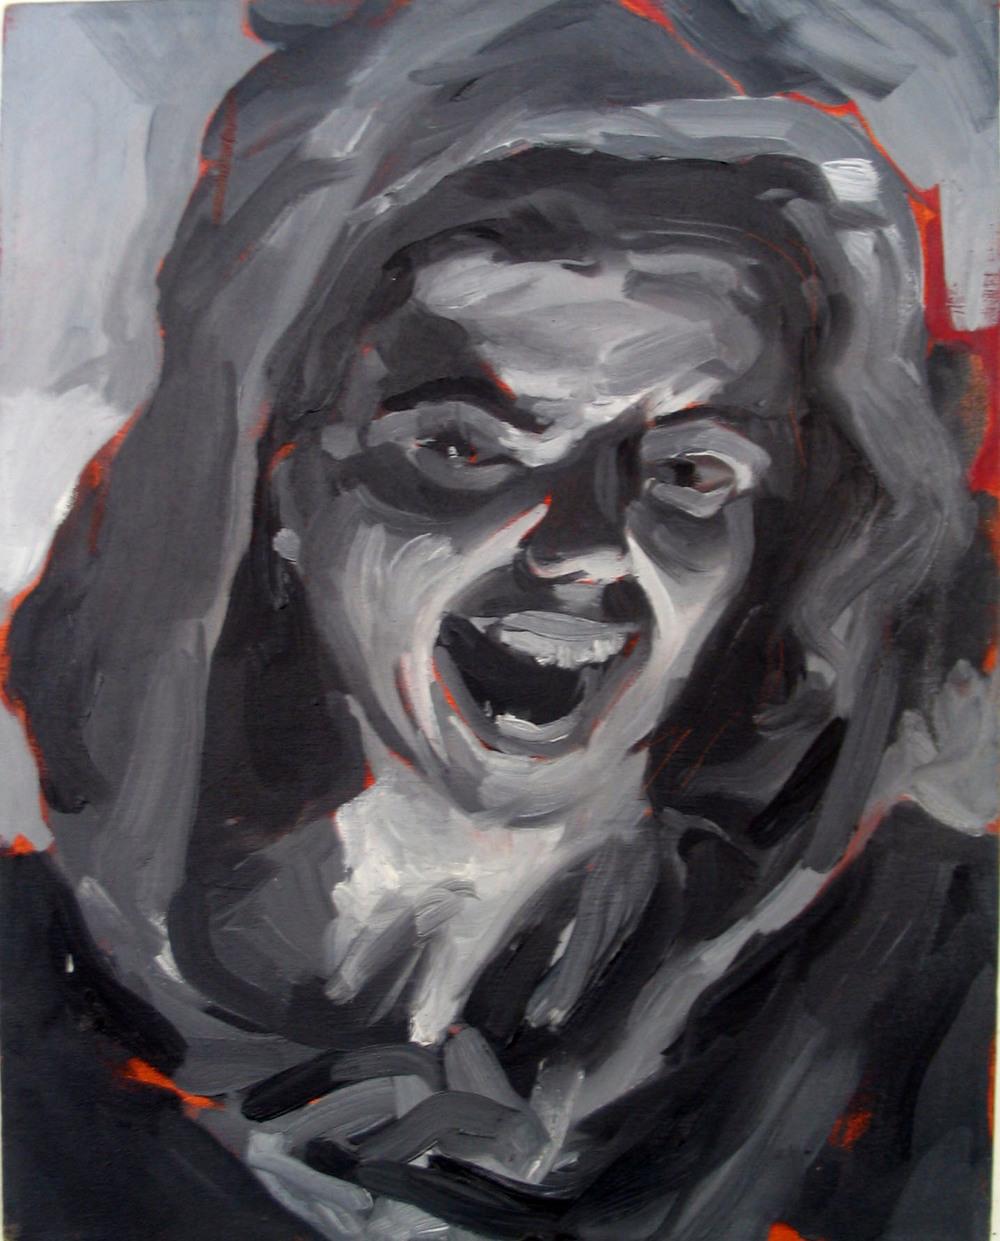 12_Painting_Portrait2_Neblett.jpg